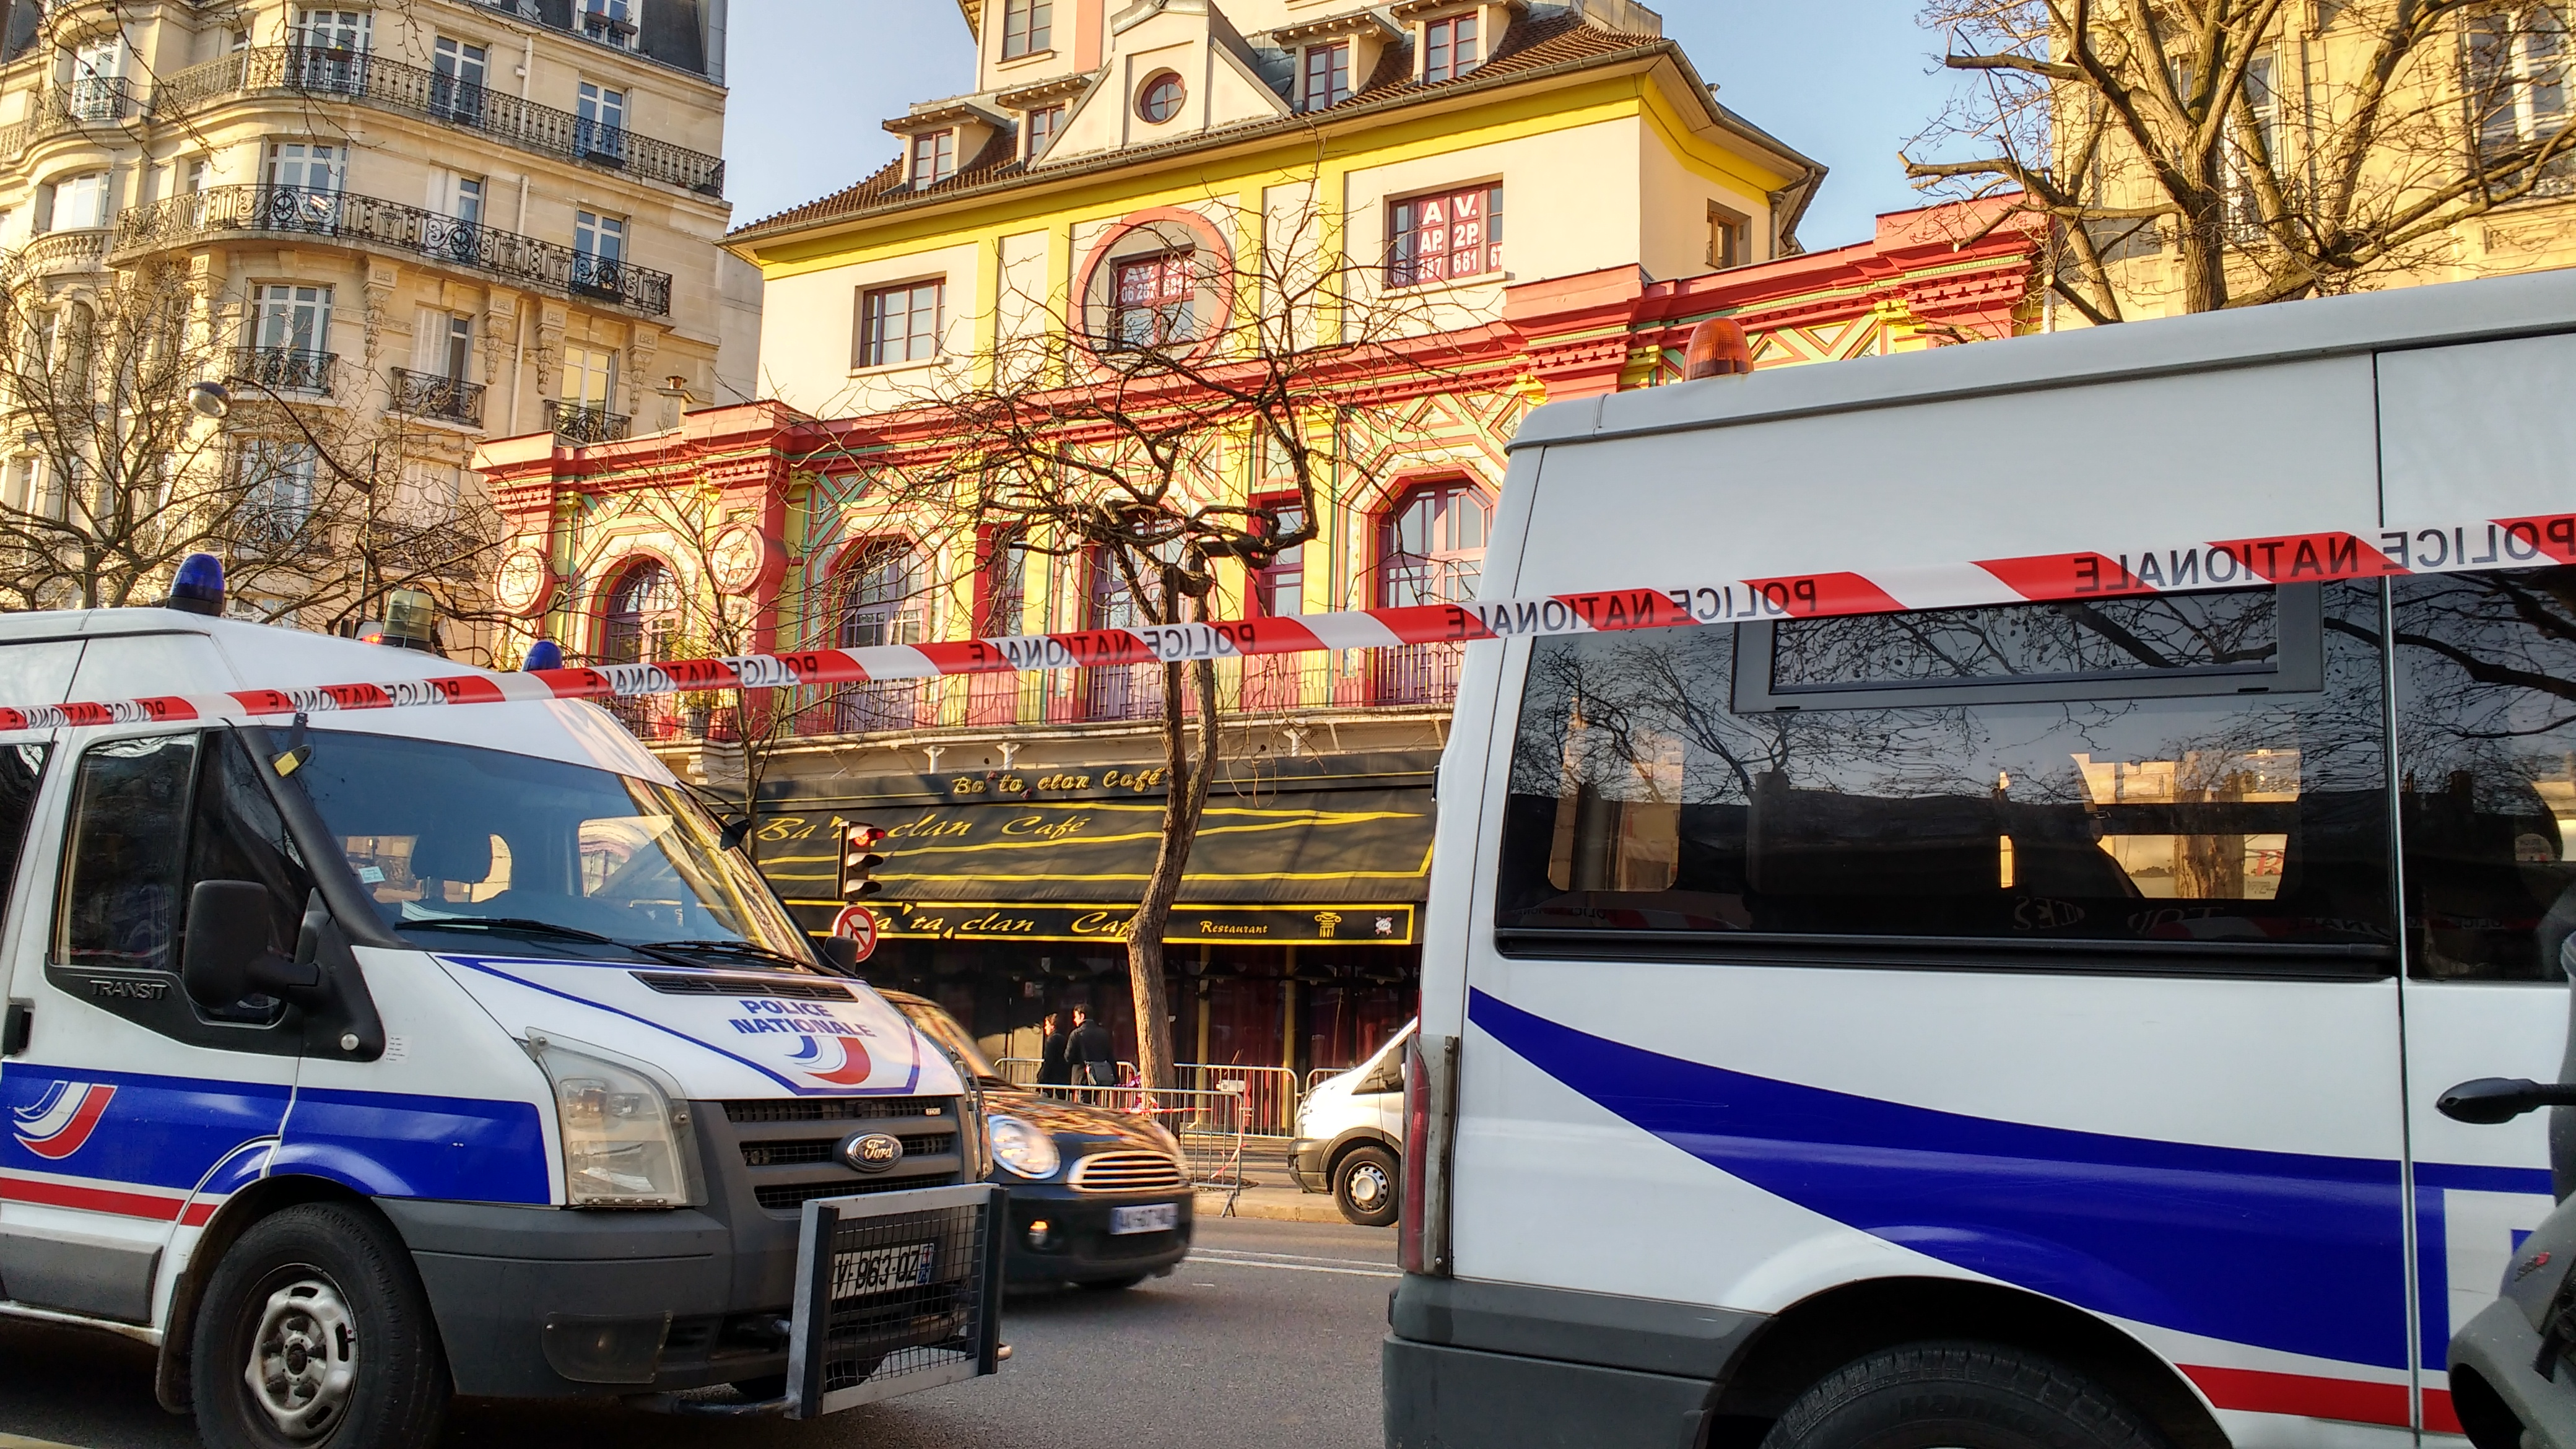 Reportage photos au Bataclan